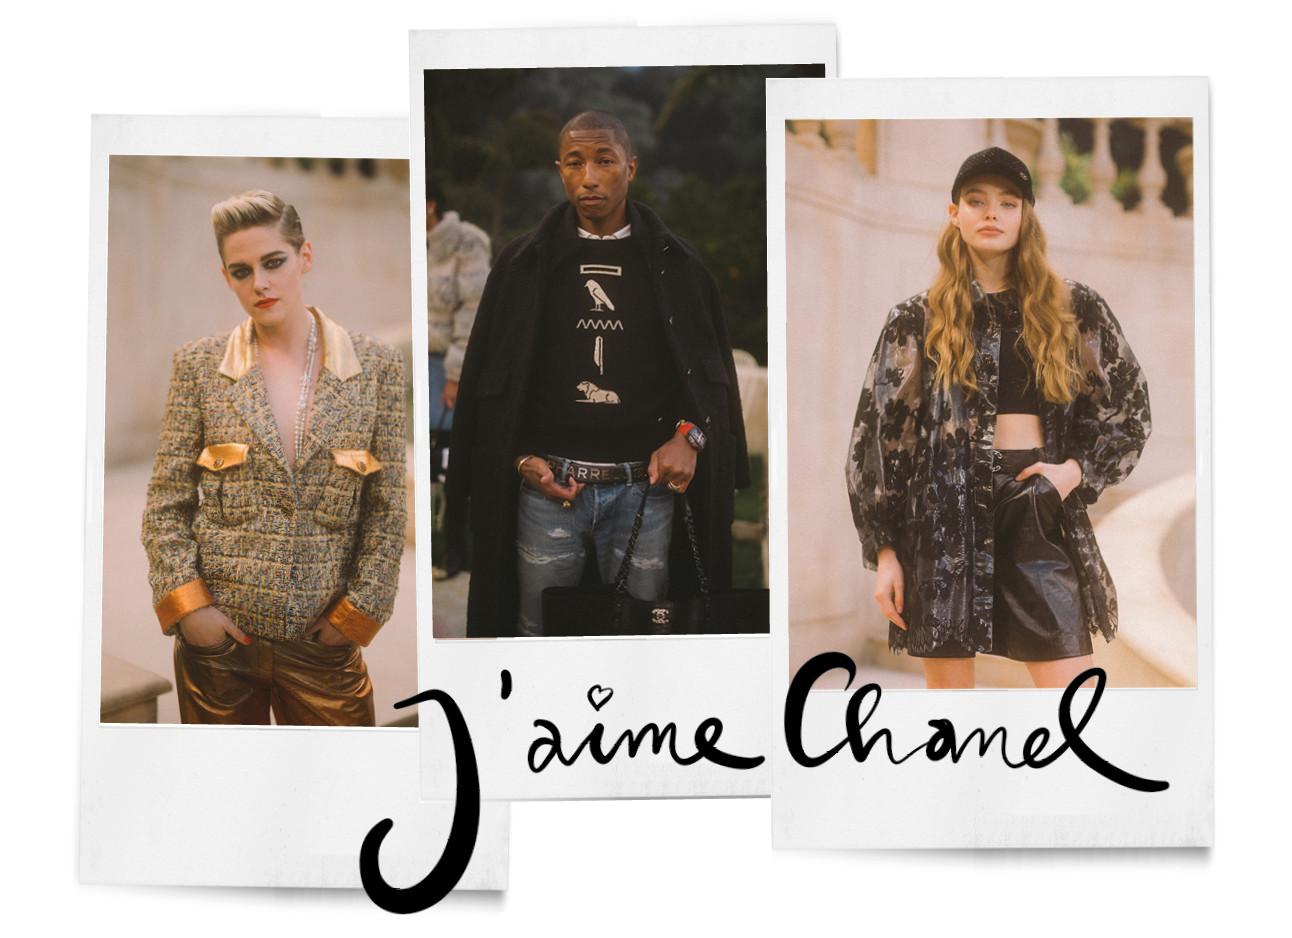 Chanel vips